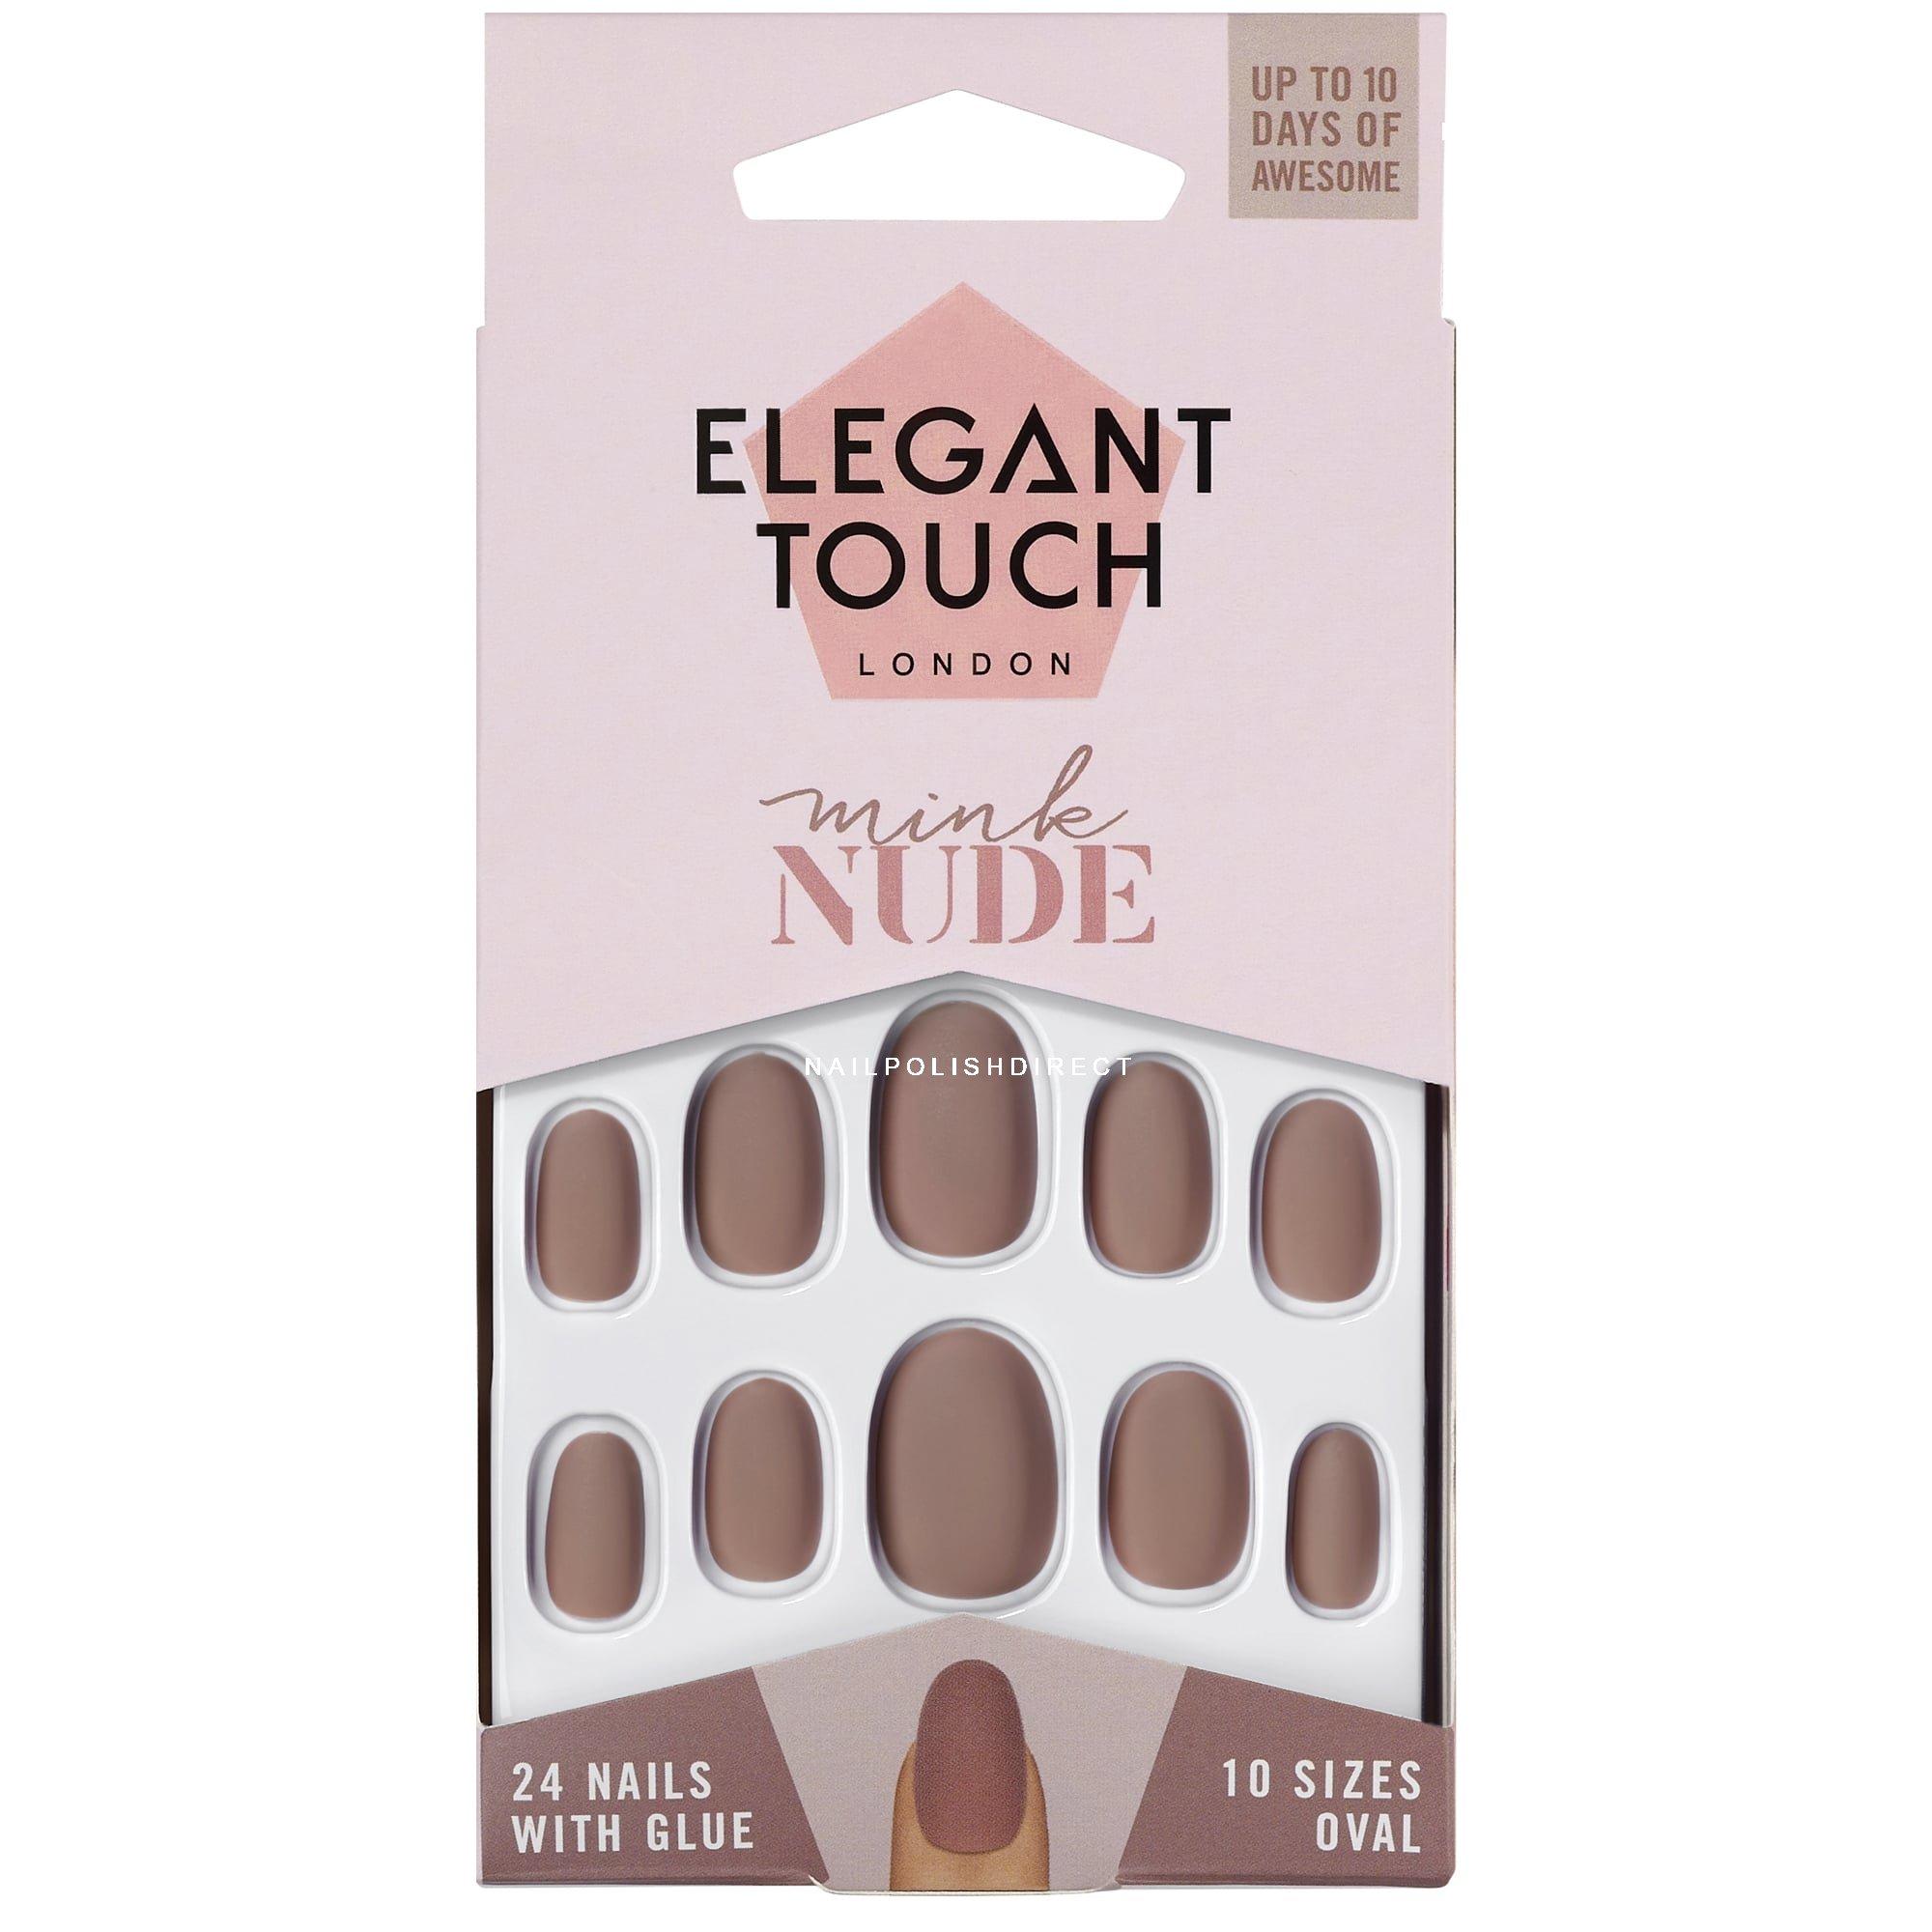 Elegant Touch False Nails - Mink Nude (24 Pack, 10 Sizes)